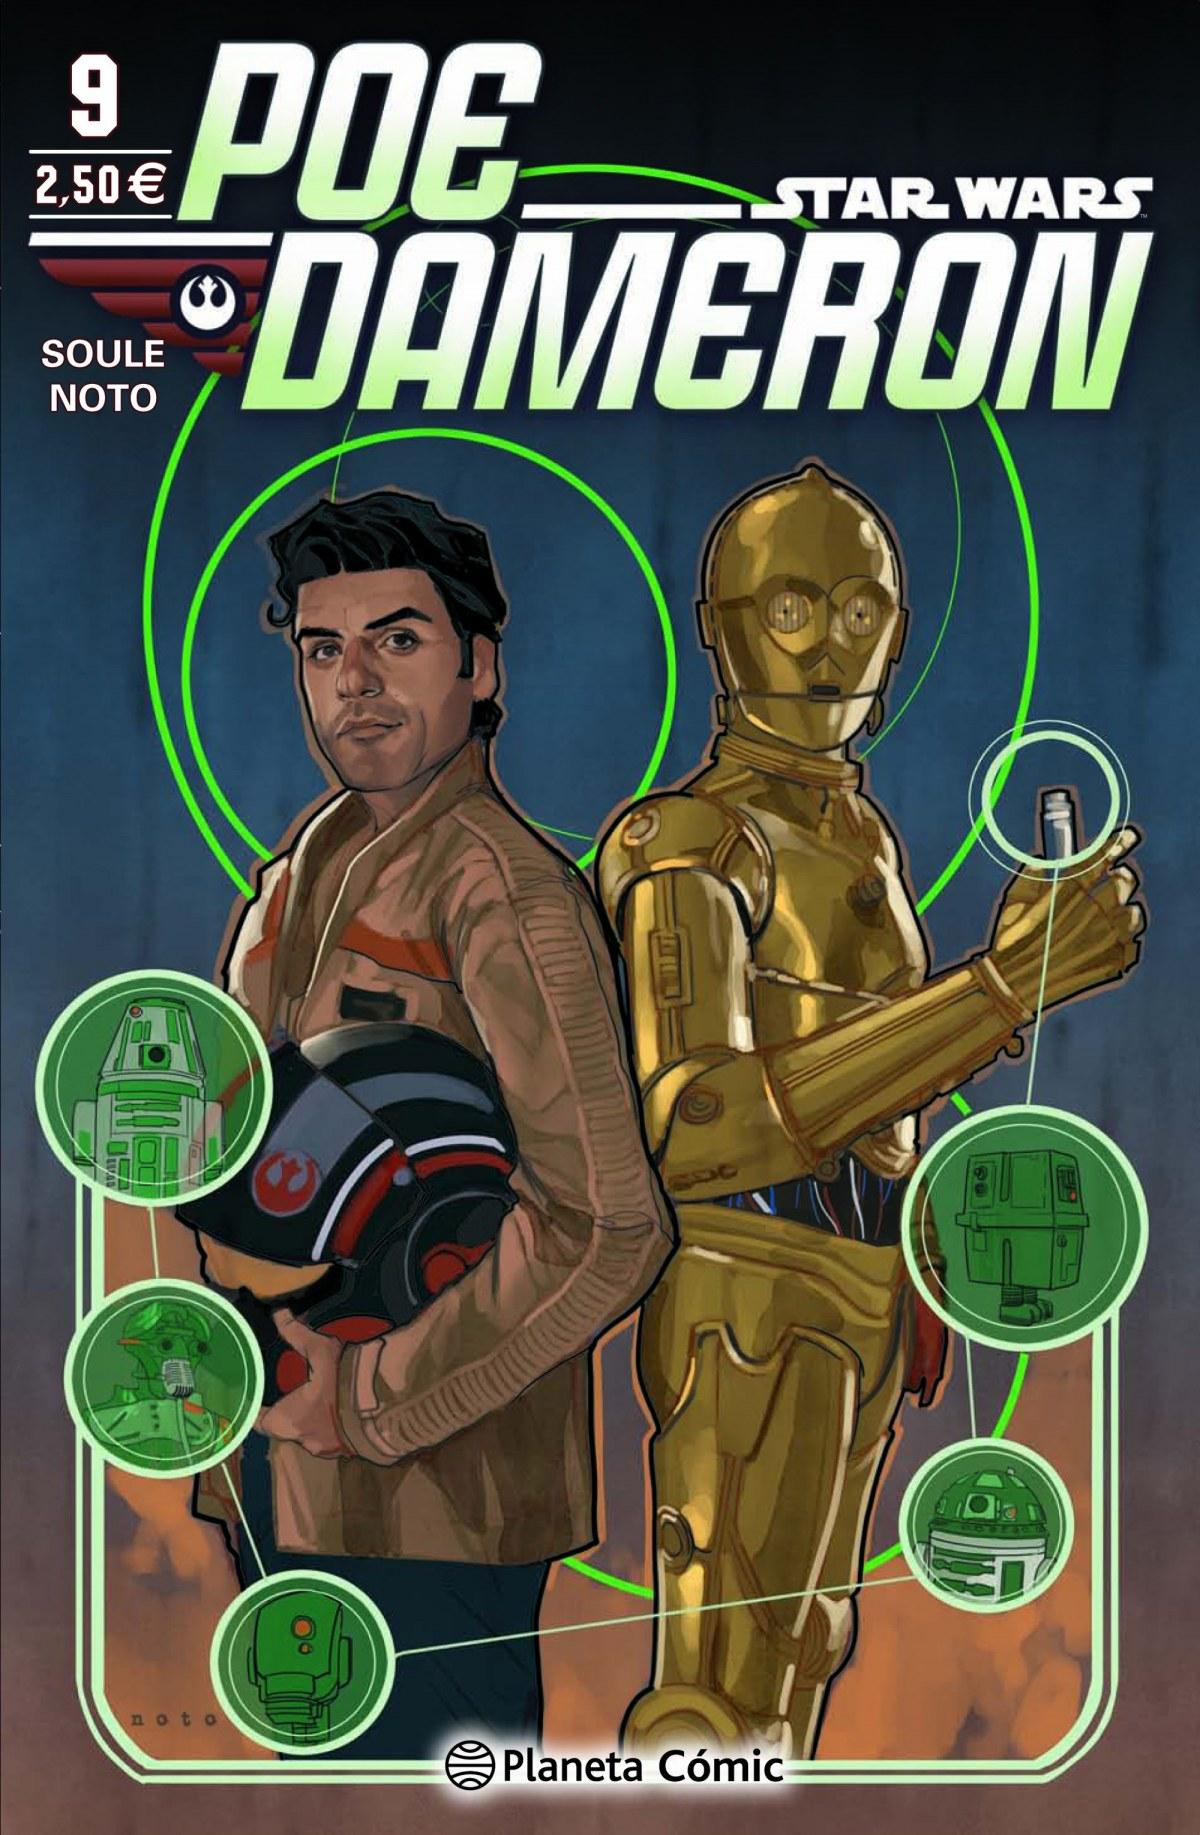 STAR WARS POE DAMERON 9